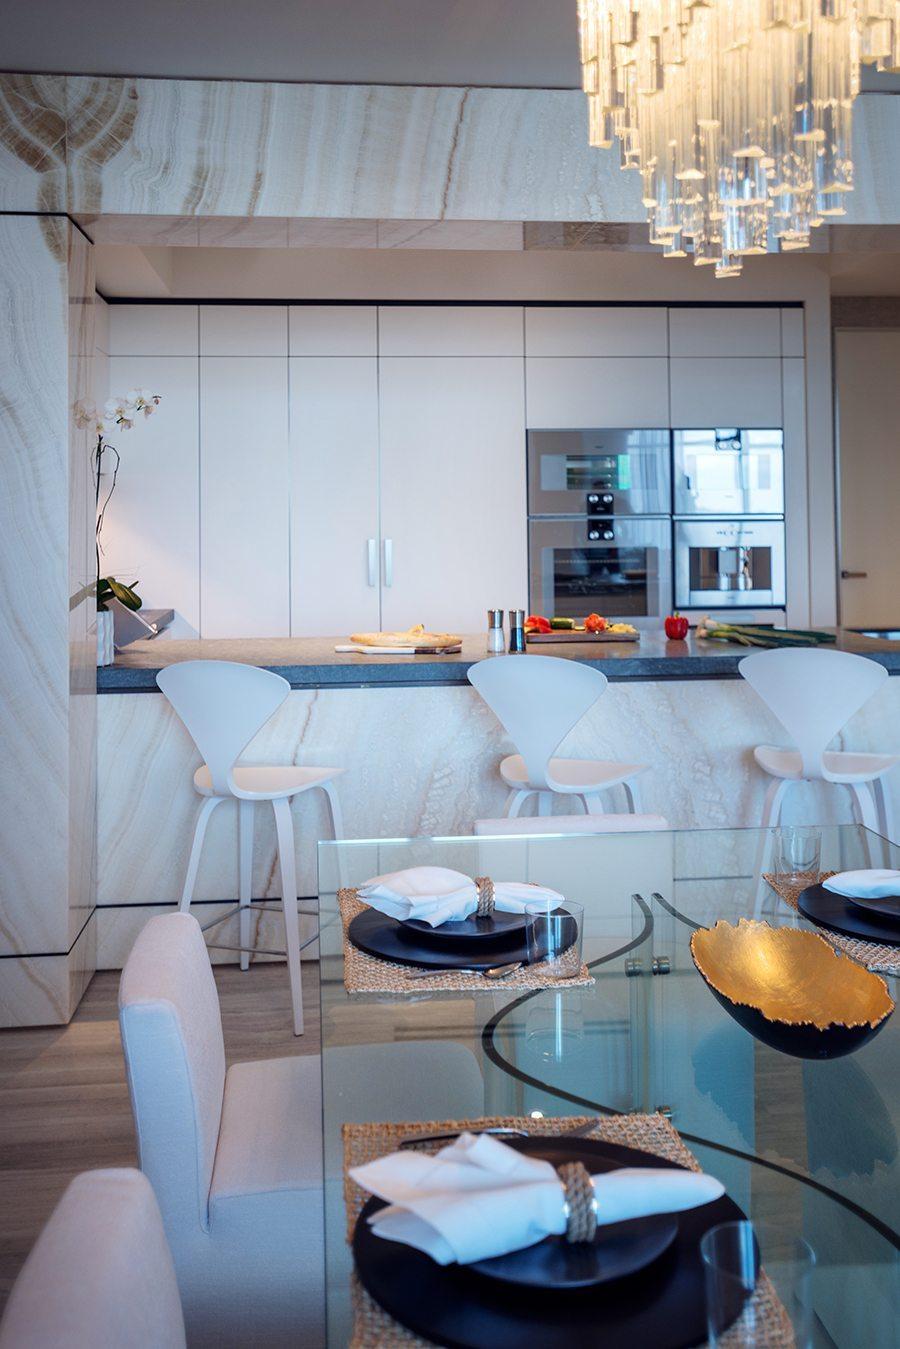 Kitchen 3_Antrobus + Ramirez Palazzo Del Sol 7052